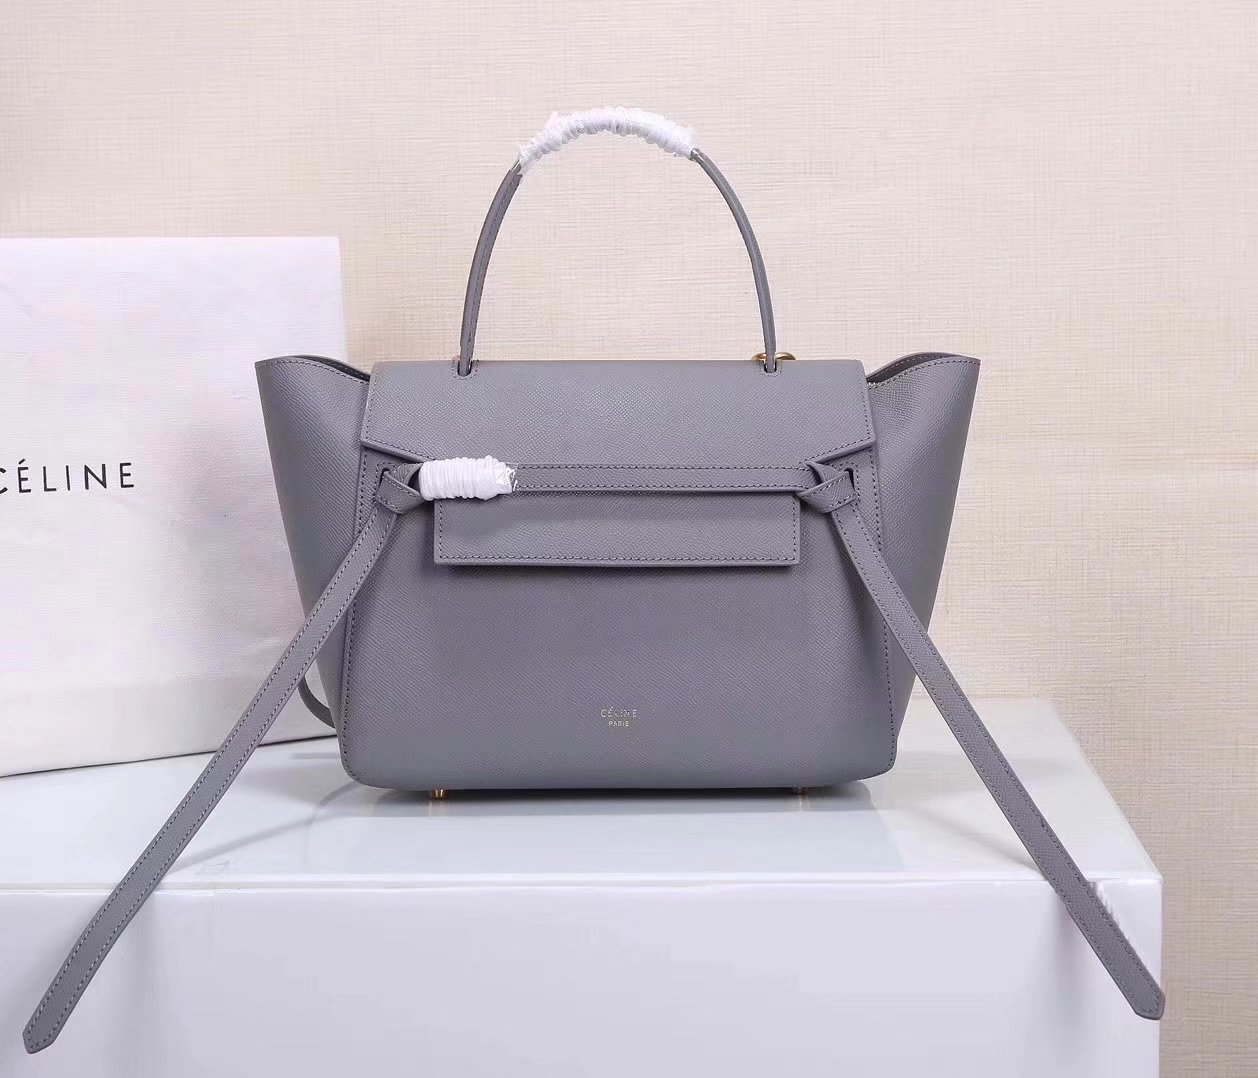 Celine Women Mini Belt Bag in Grained Calfskin Leather Dark Grey